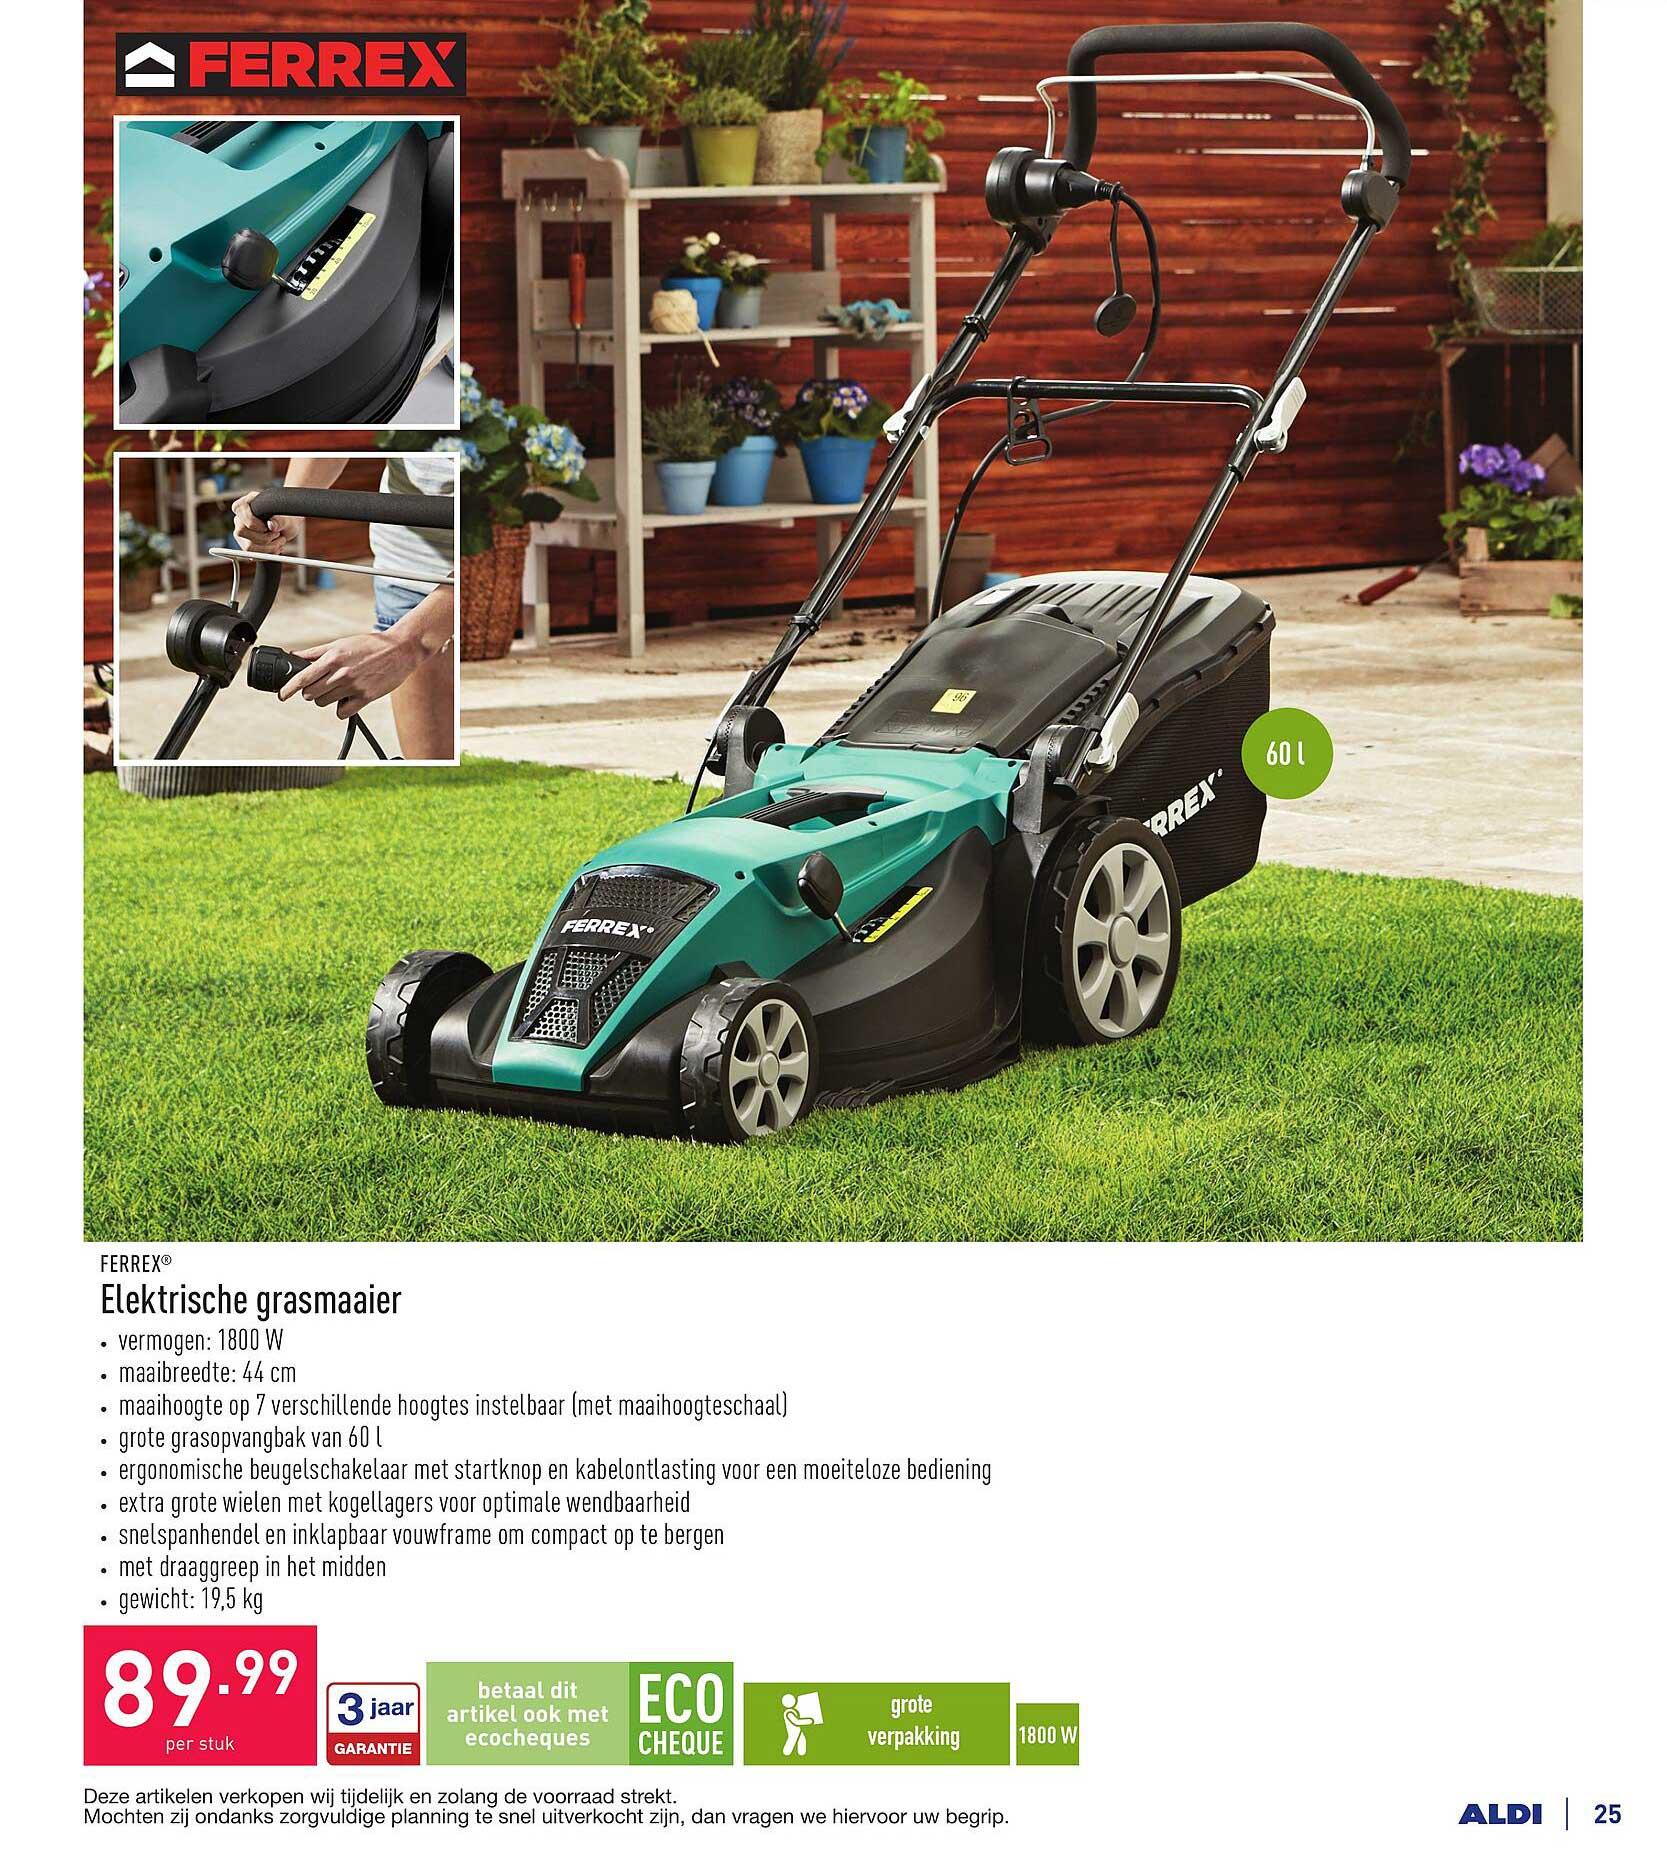 ALDI Ferrex Elektrische Grasmaaier